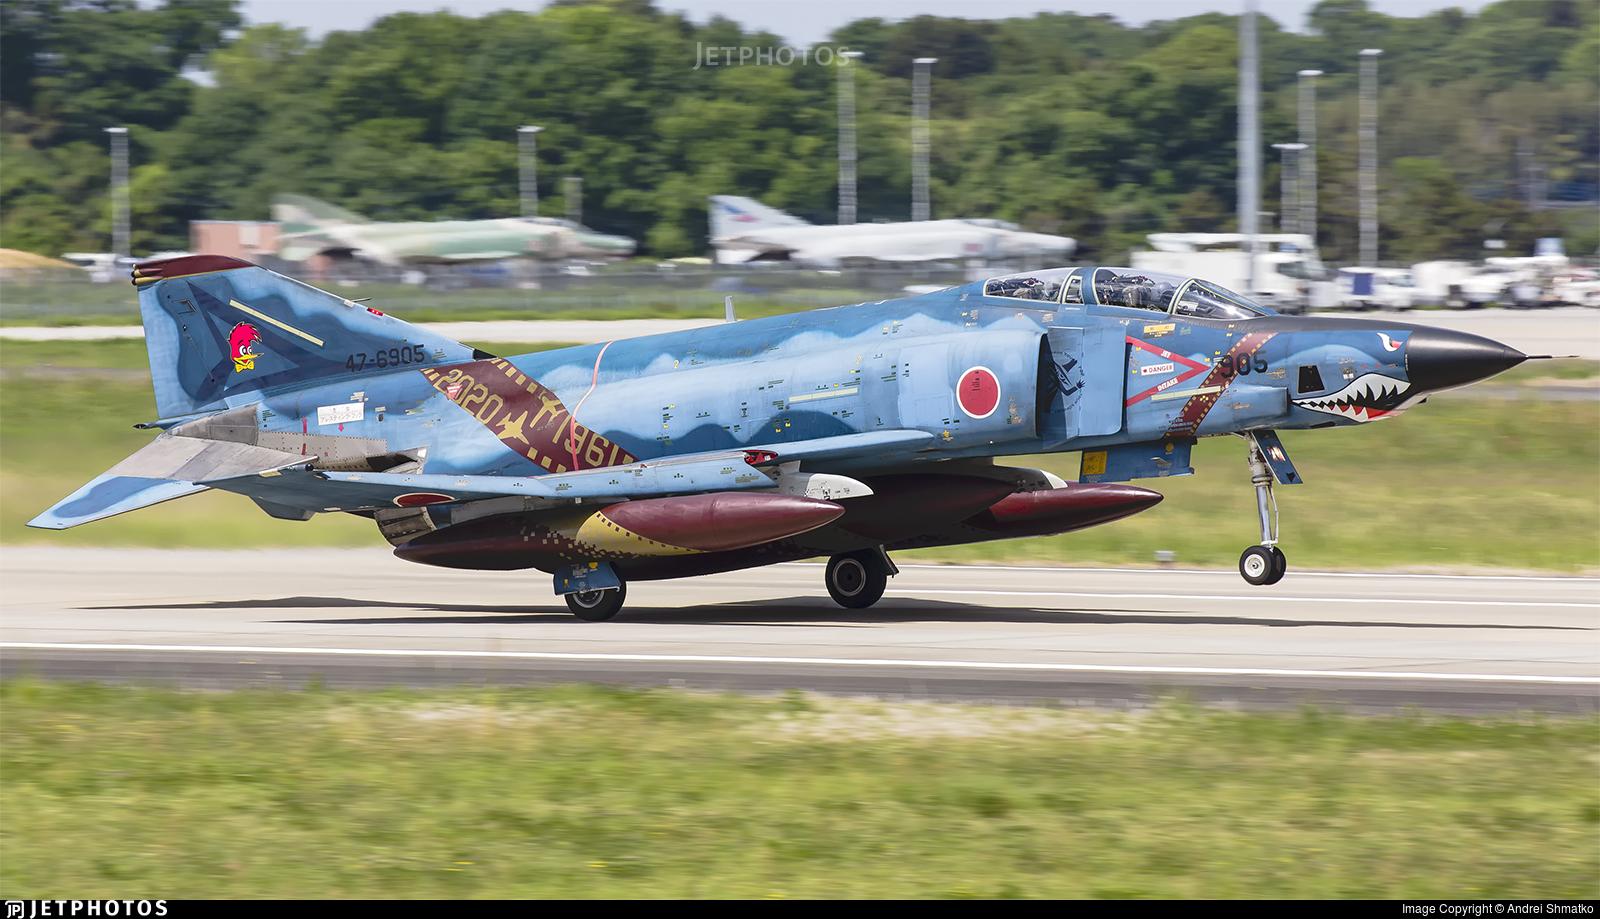 47-6905 - McDonnell Douglas RF-4E Phantom II - Japan - Air Self Defence Force (JASDF)